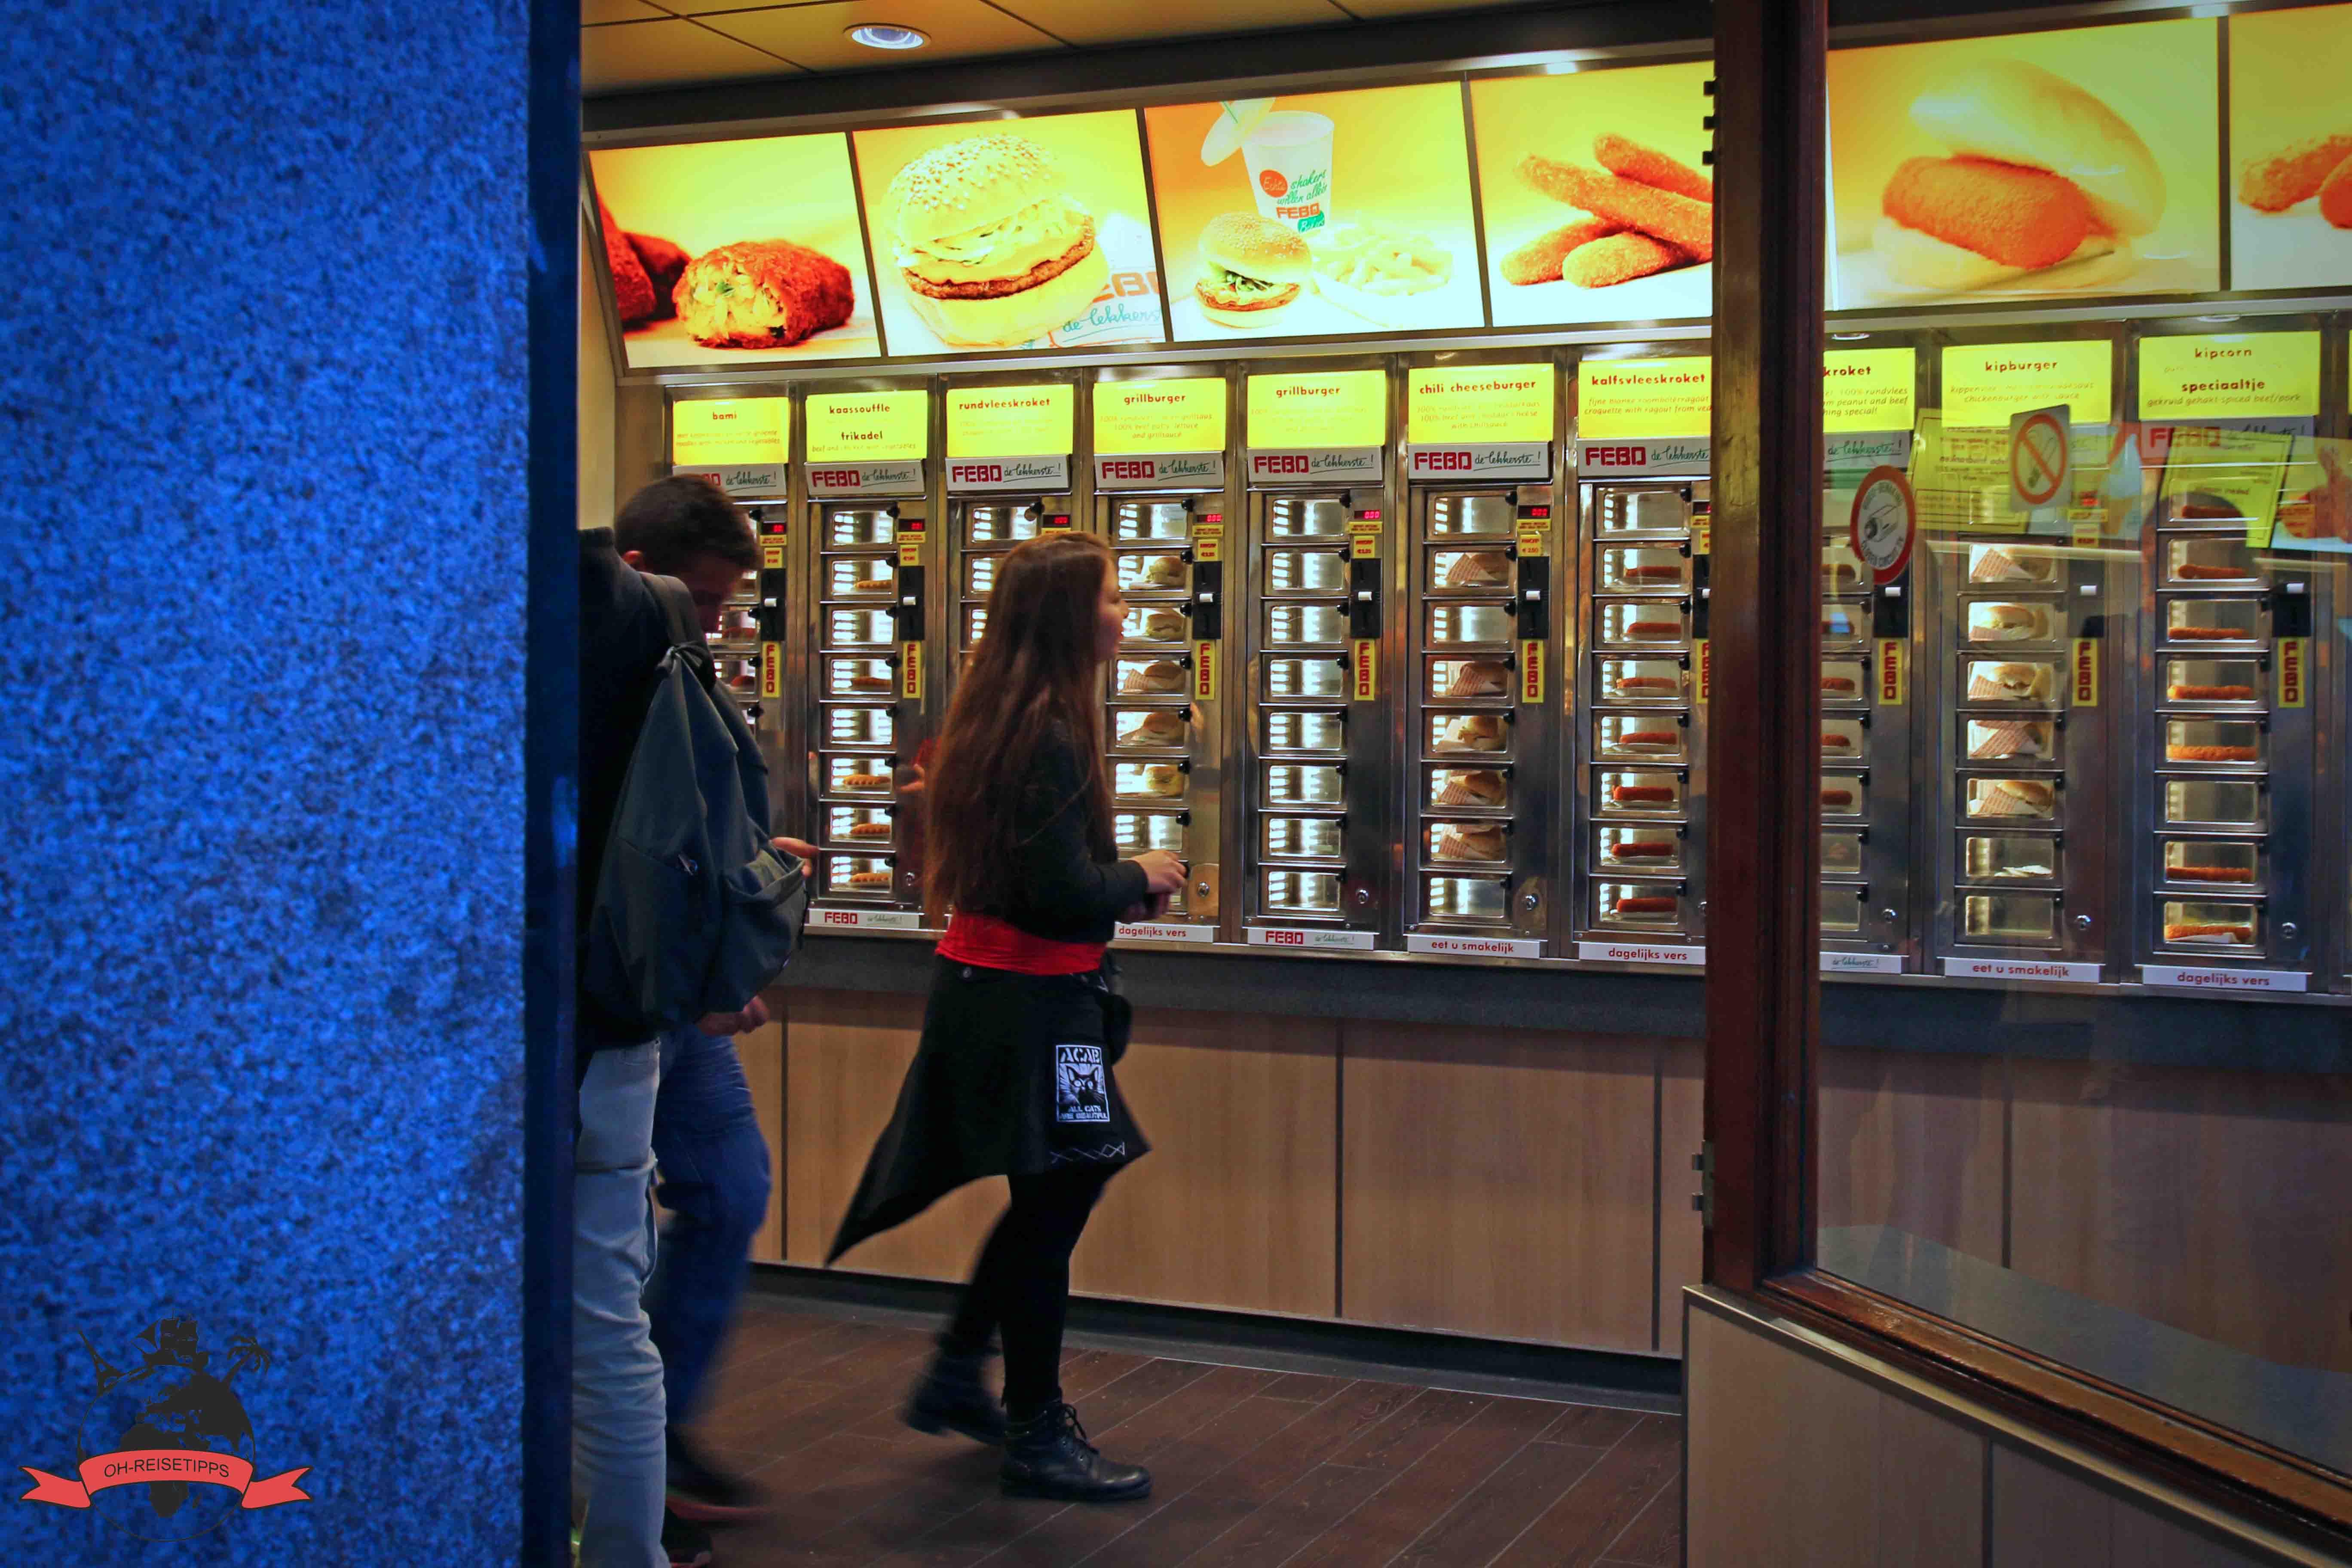 niederlande-amsterdam-geschaefte-hamburger-automat